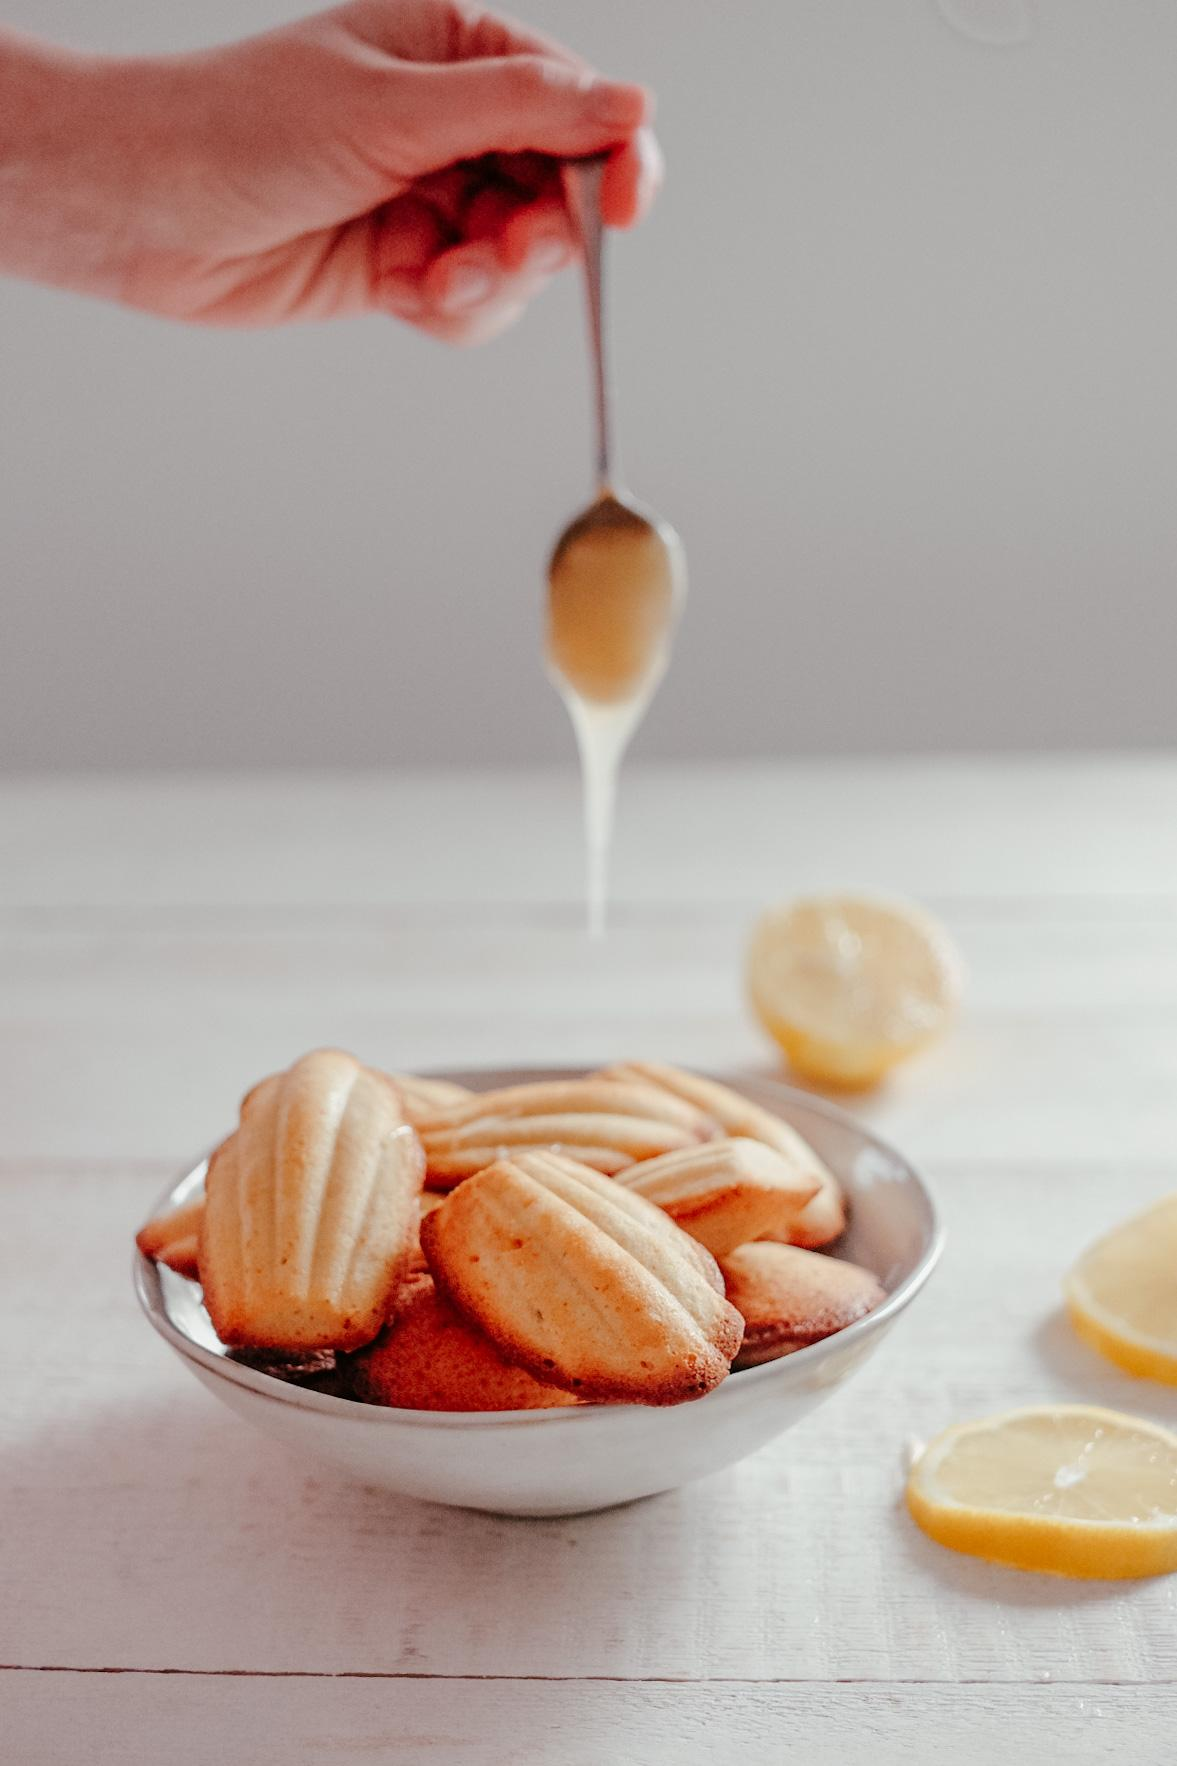 Les Madeleines au miel